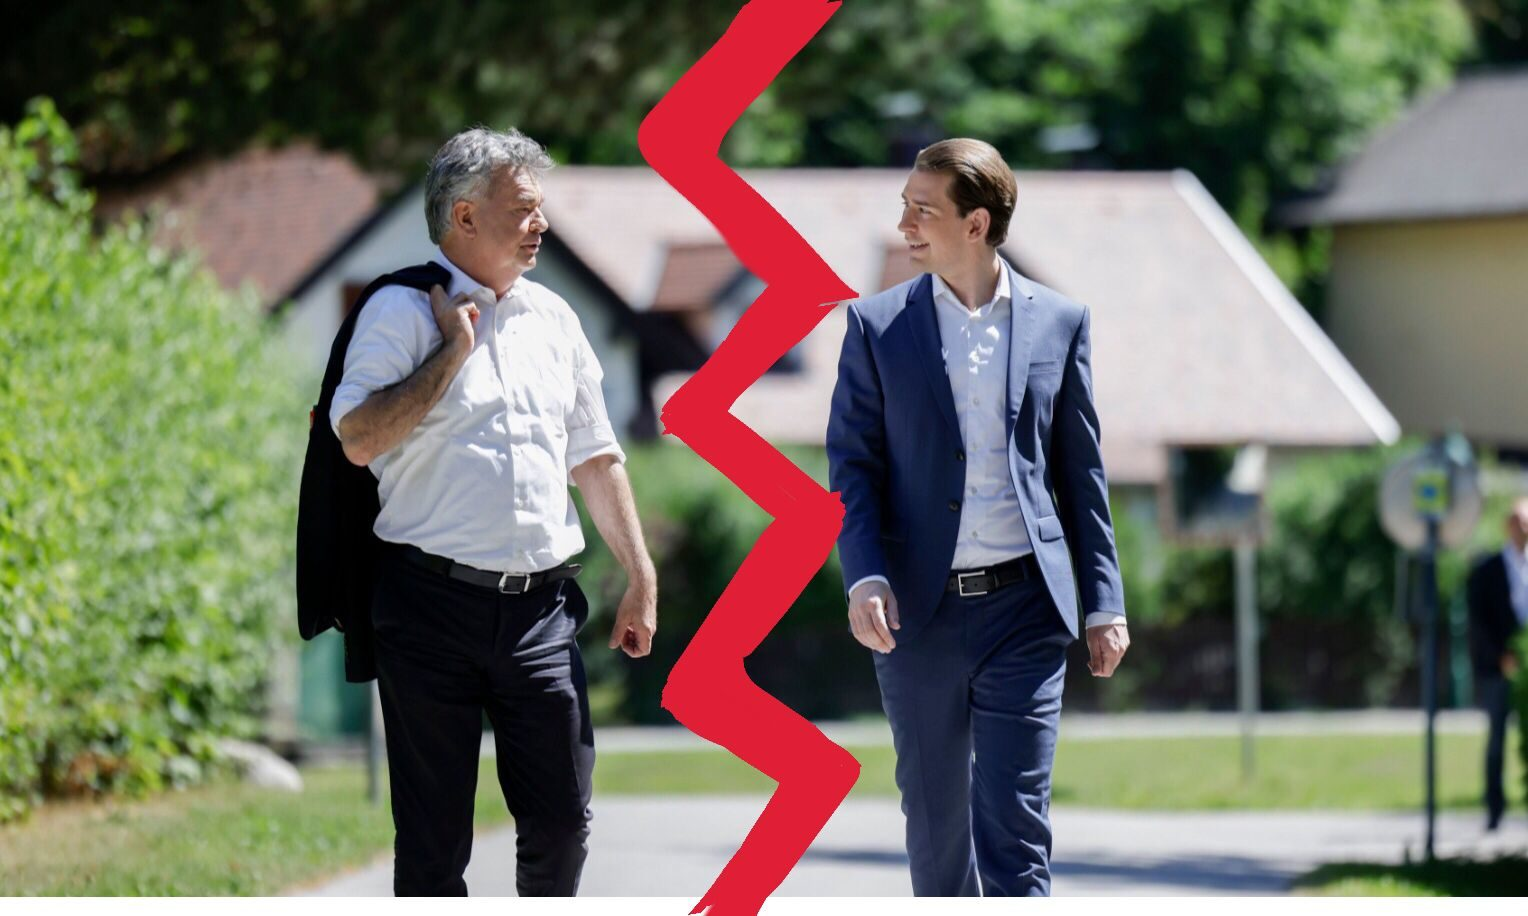 Werner Kogler / Sebastian Kurz / Blitz